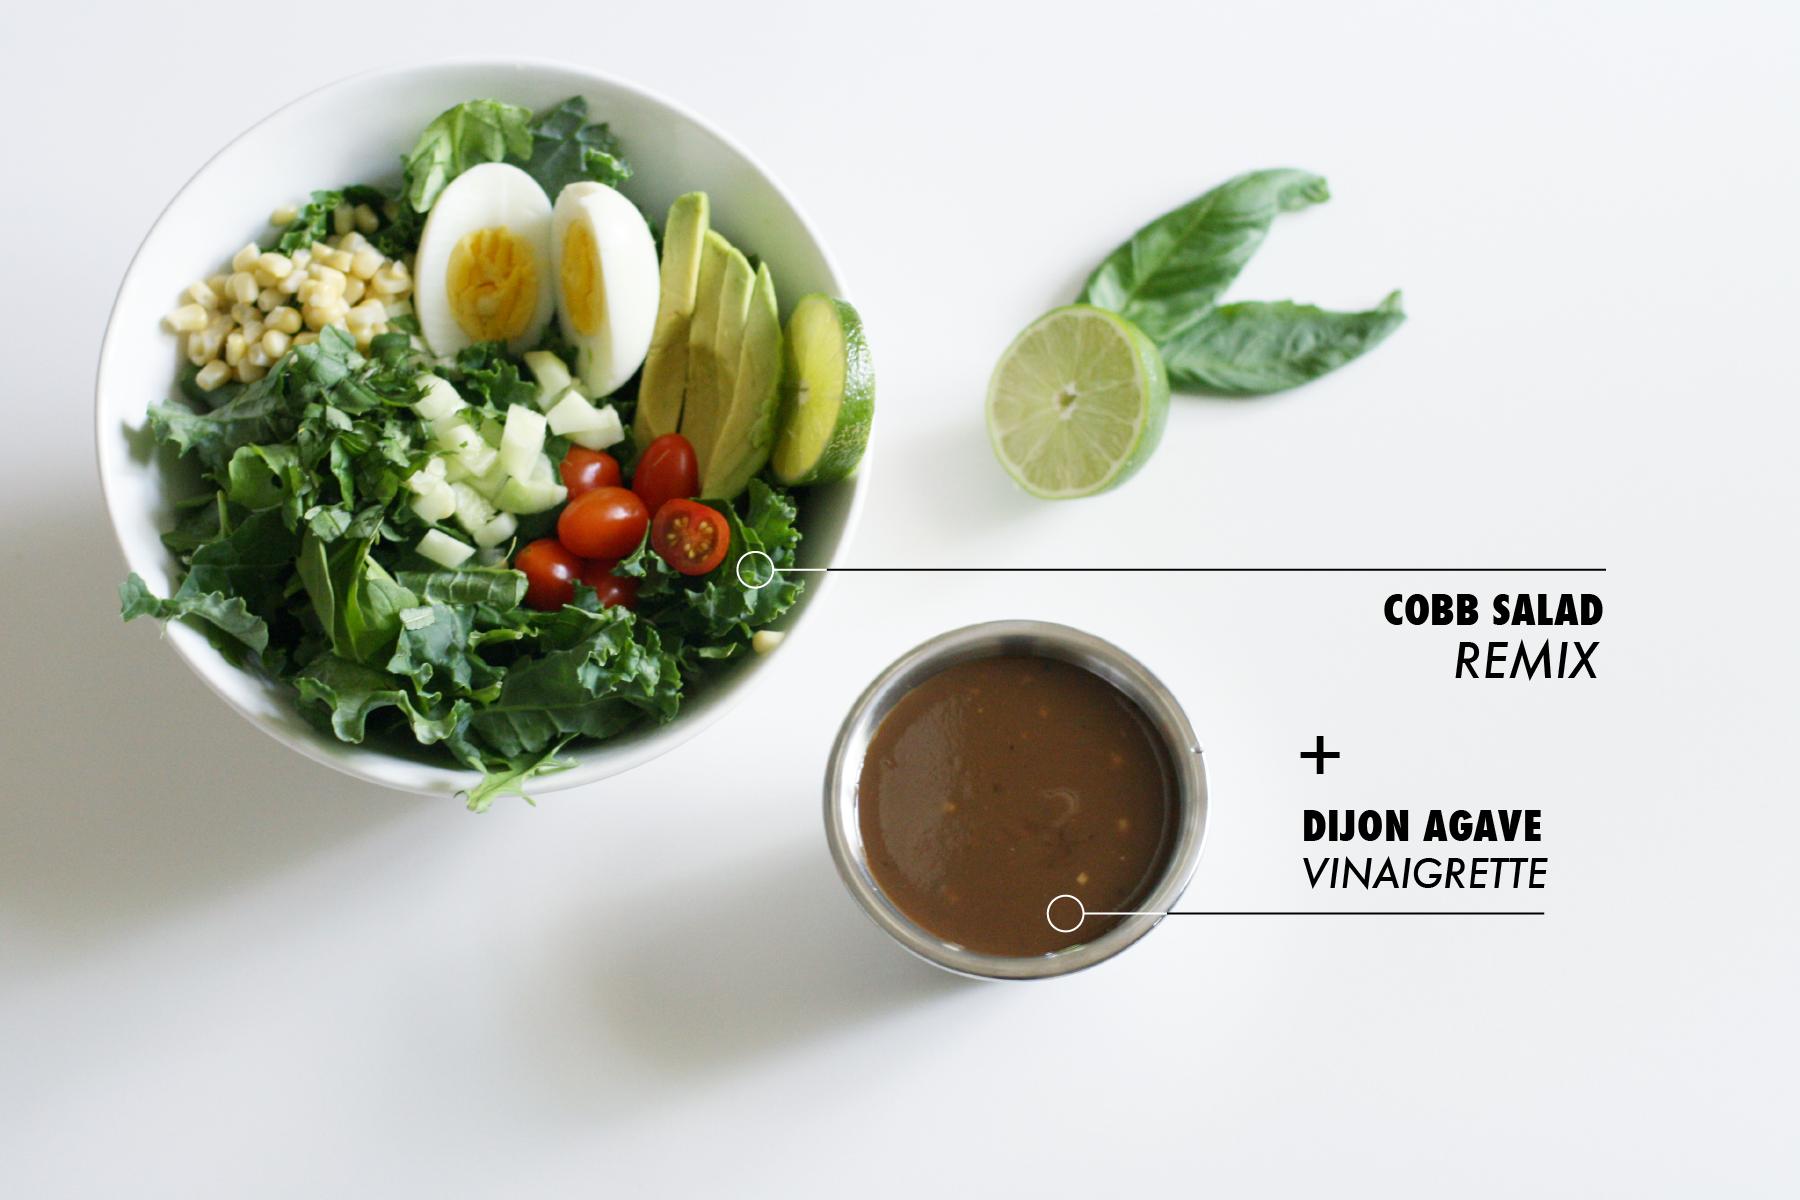 cobb-salad-remix-1